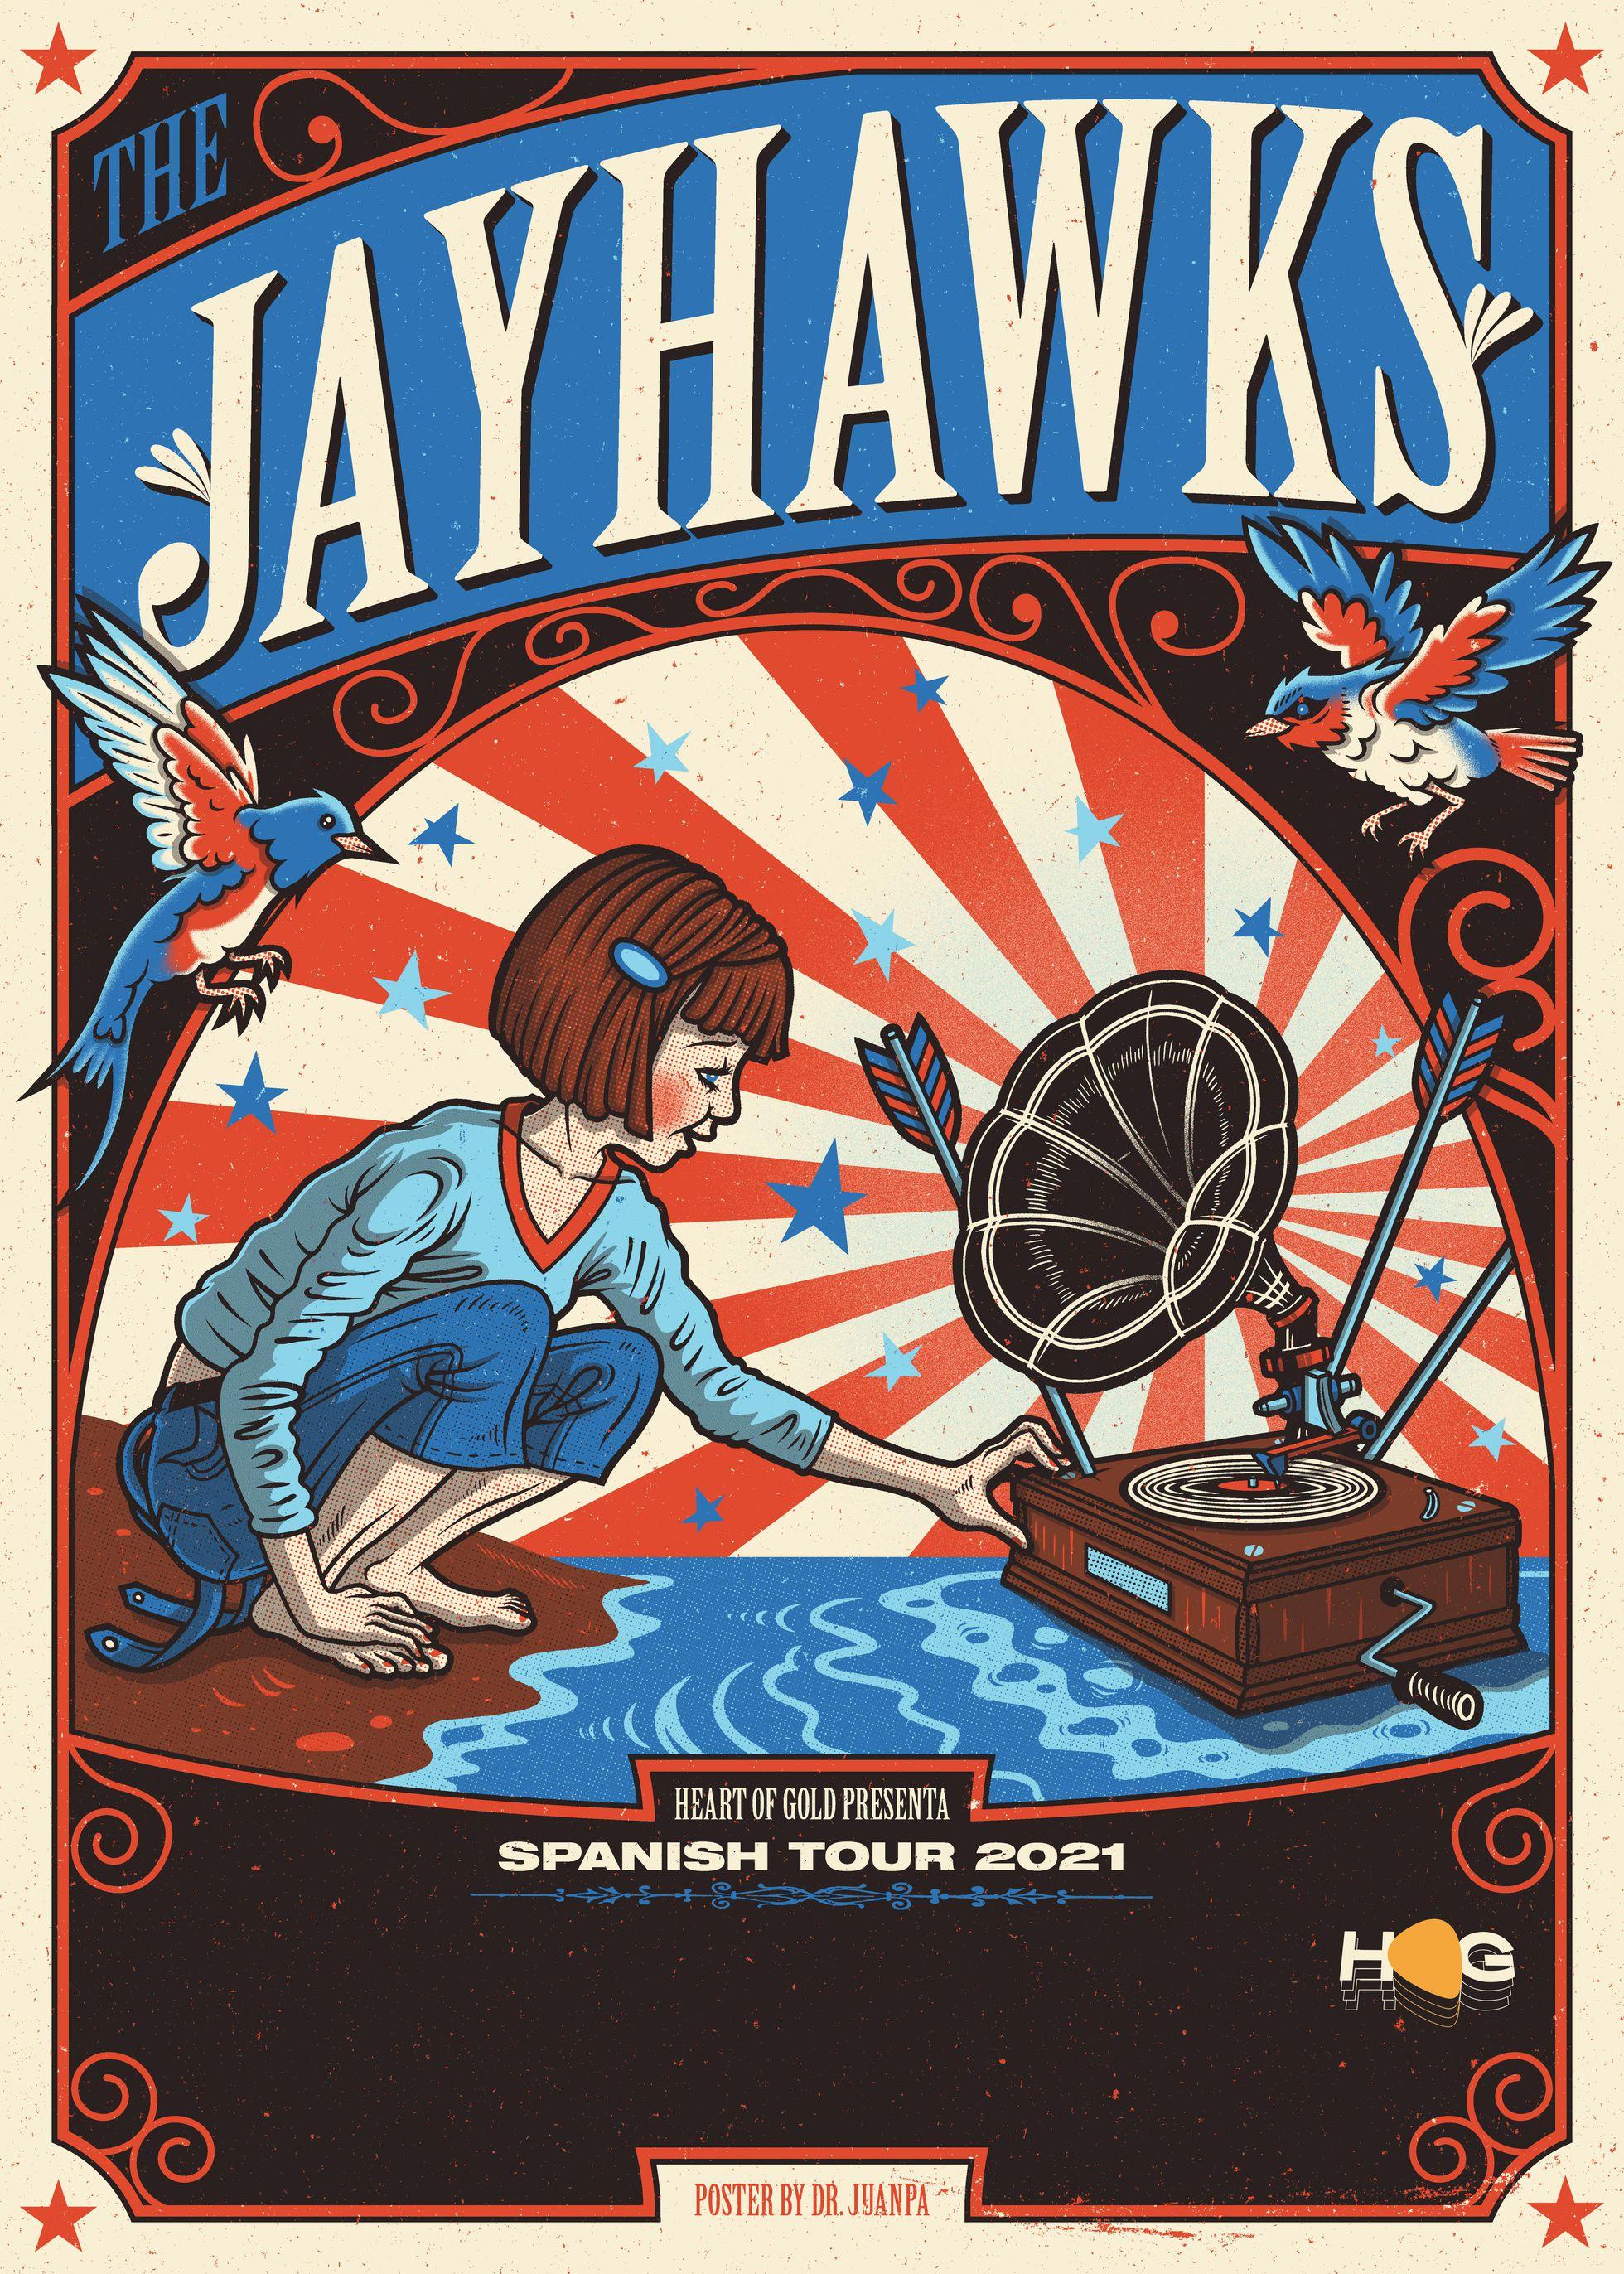 The Jayhawks - Página 13 IQYHGICIYNCMFFKNA67KARBMIU